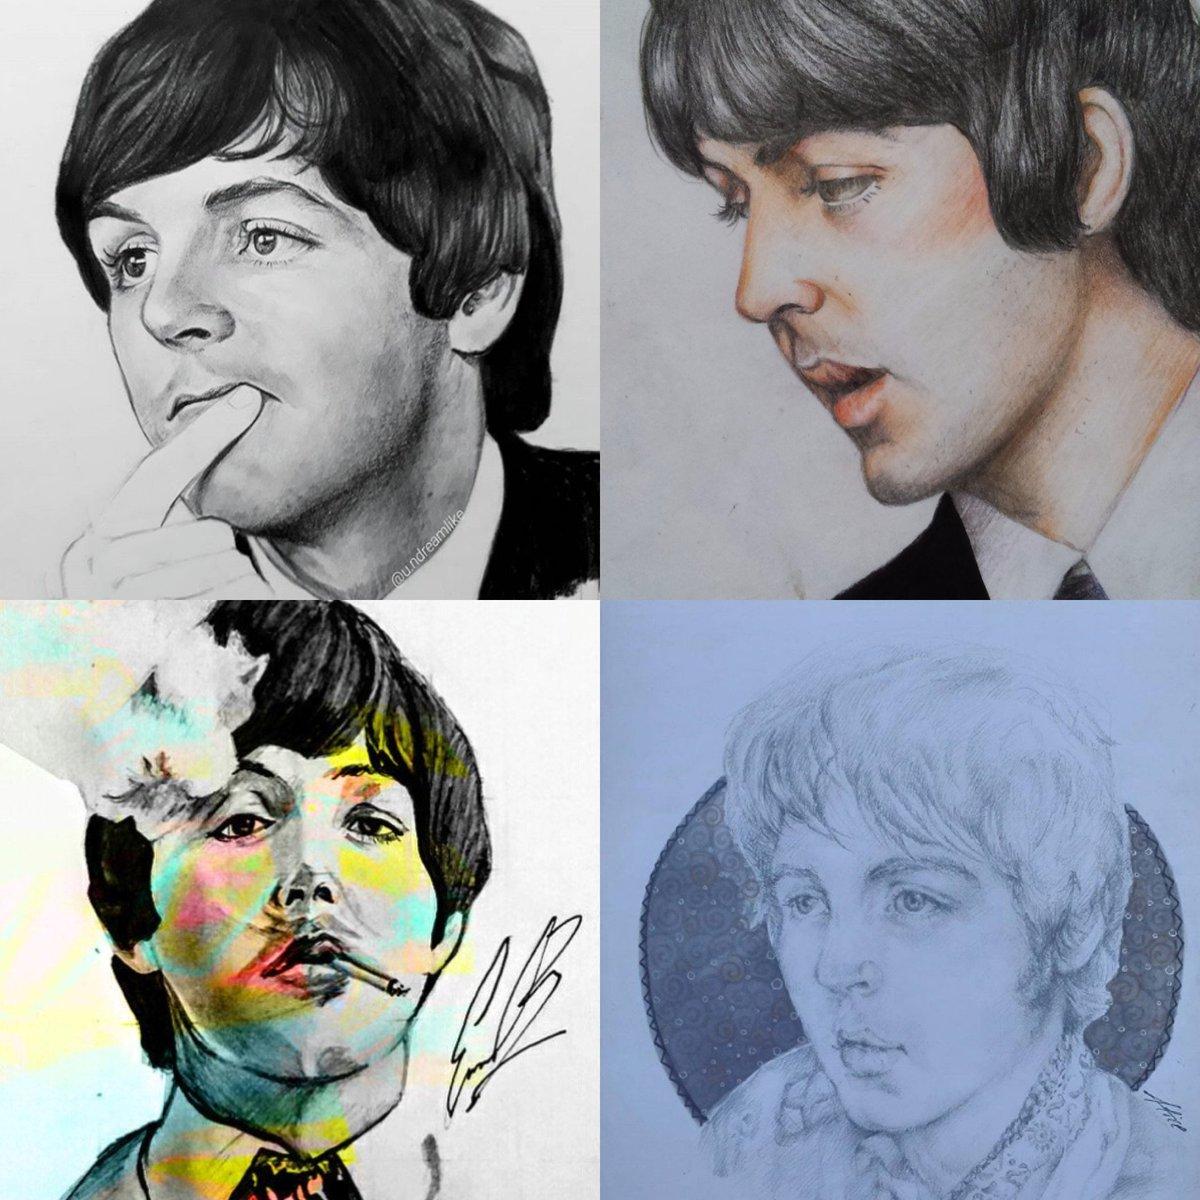 Paul McCartney On Twitter FanArtFriday By User Izlata94 And Instagram Users Alice 99 Eab Arte Undreamlike Share Your Fanart Using